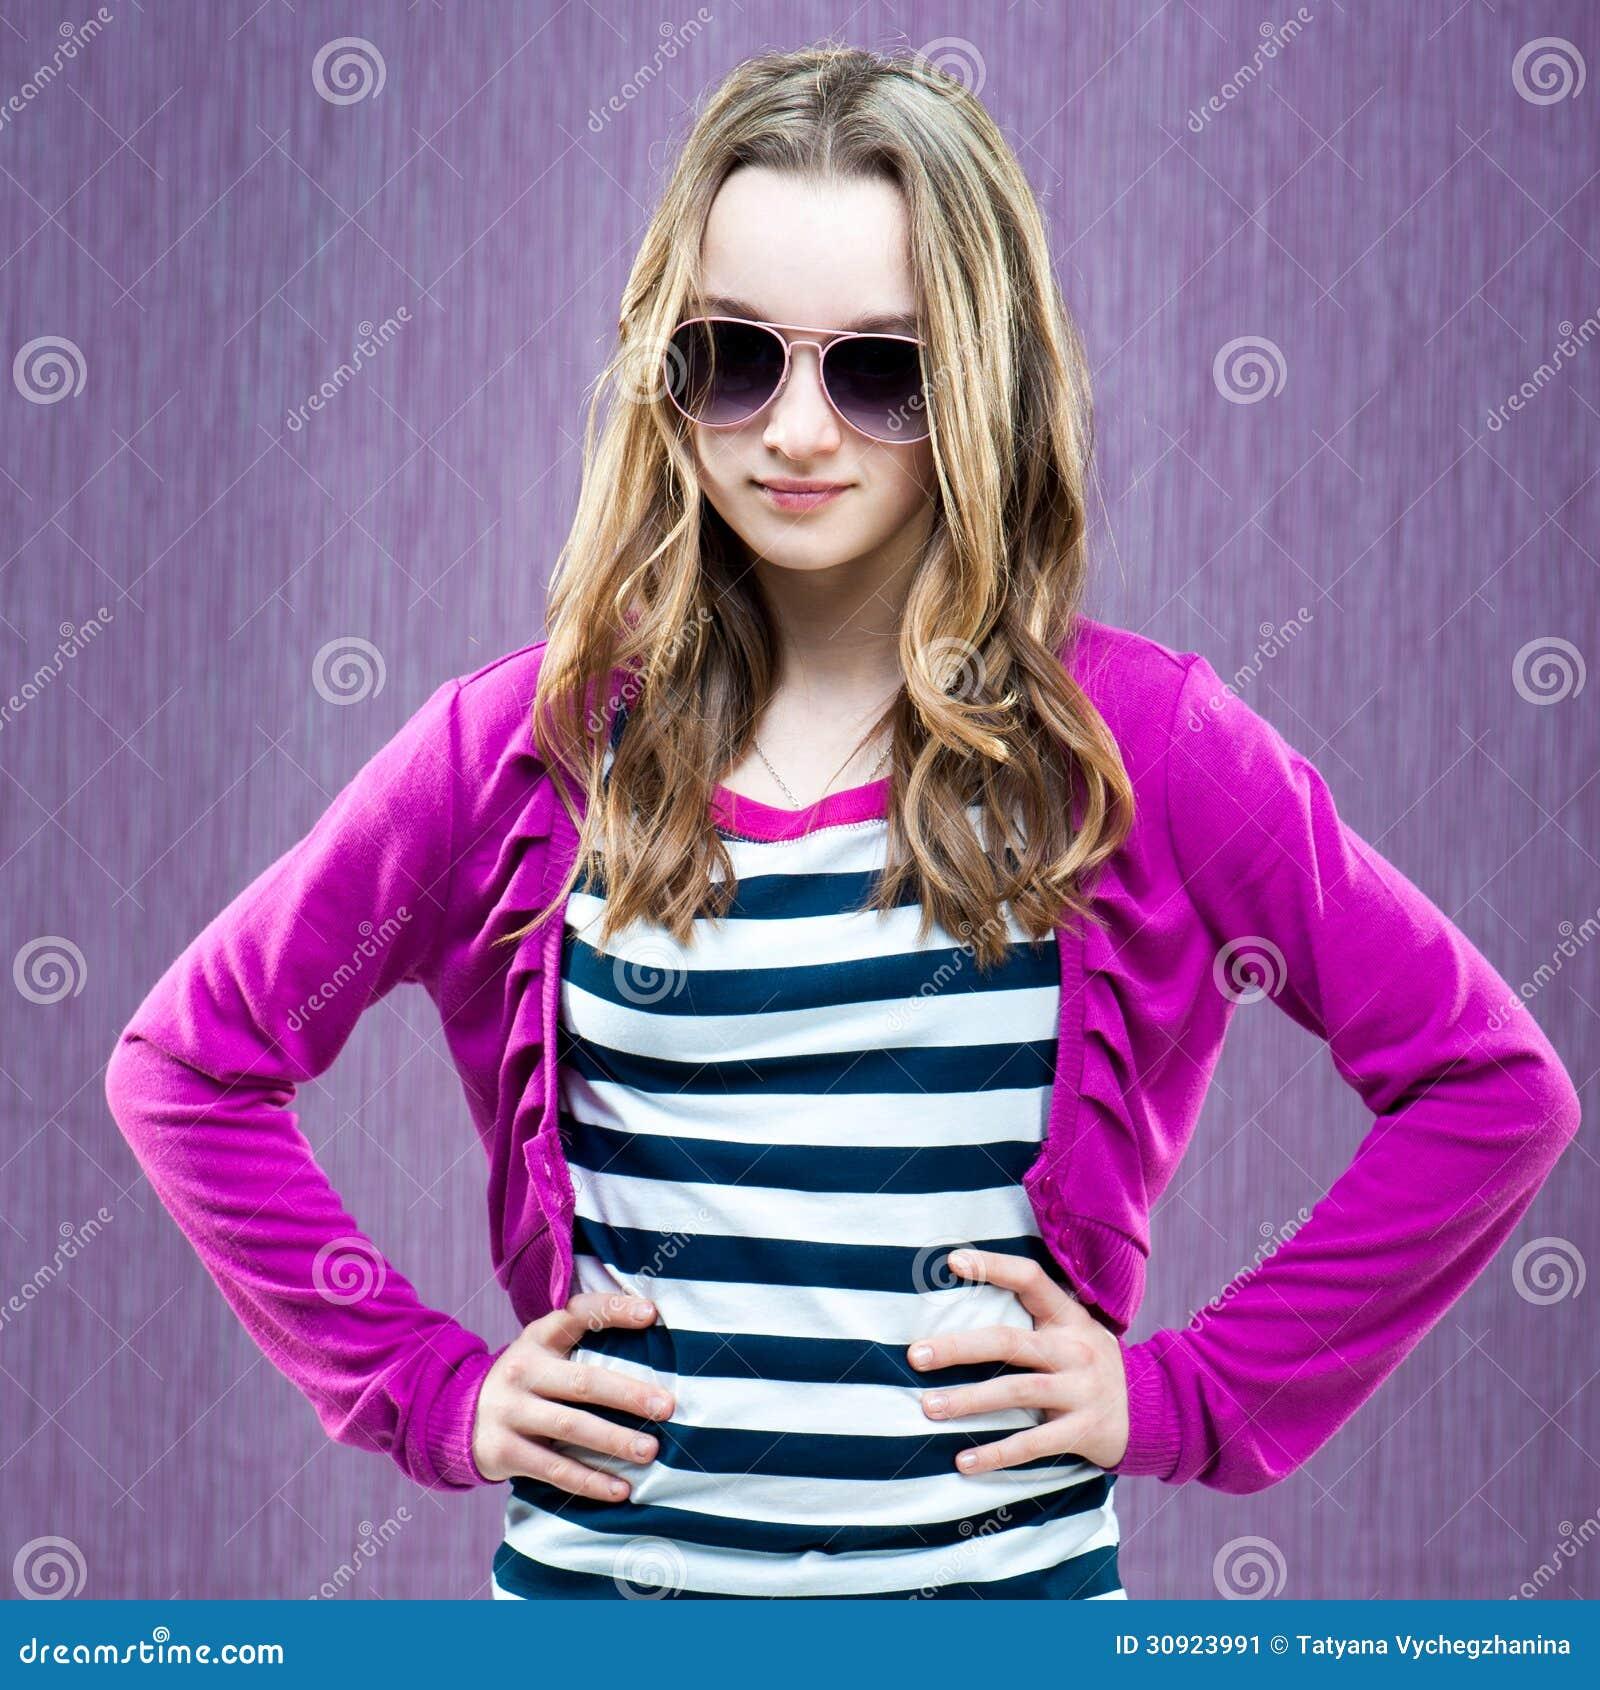 Beautiful little fashion model in sunglasses on a purple background